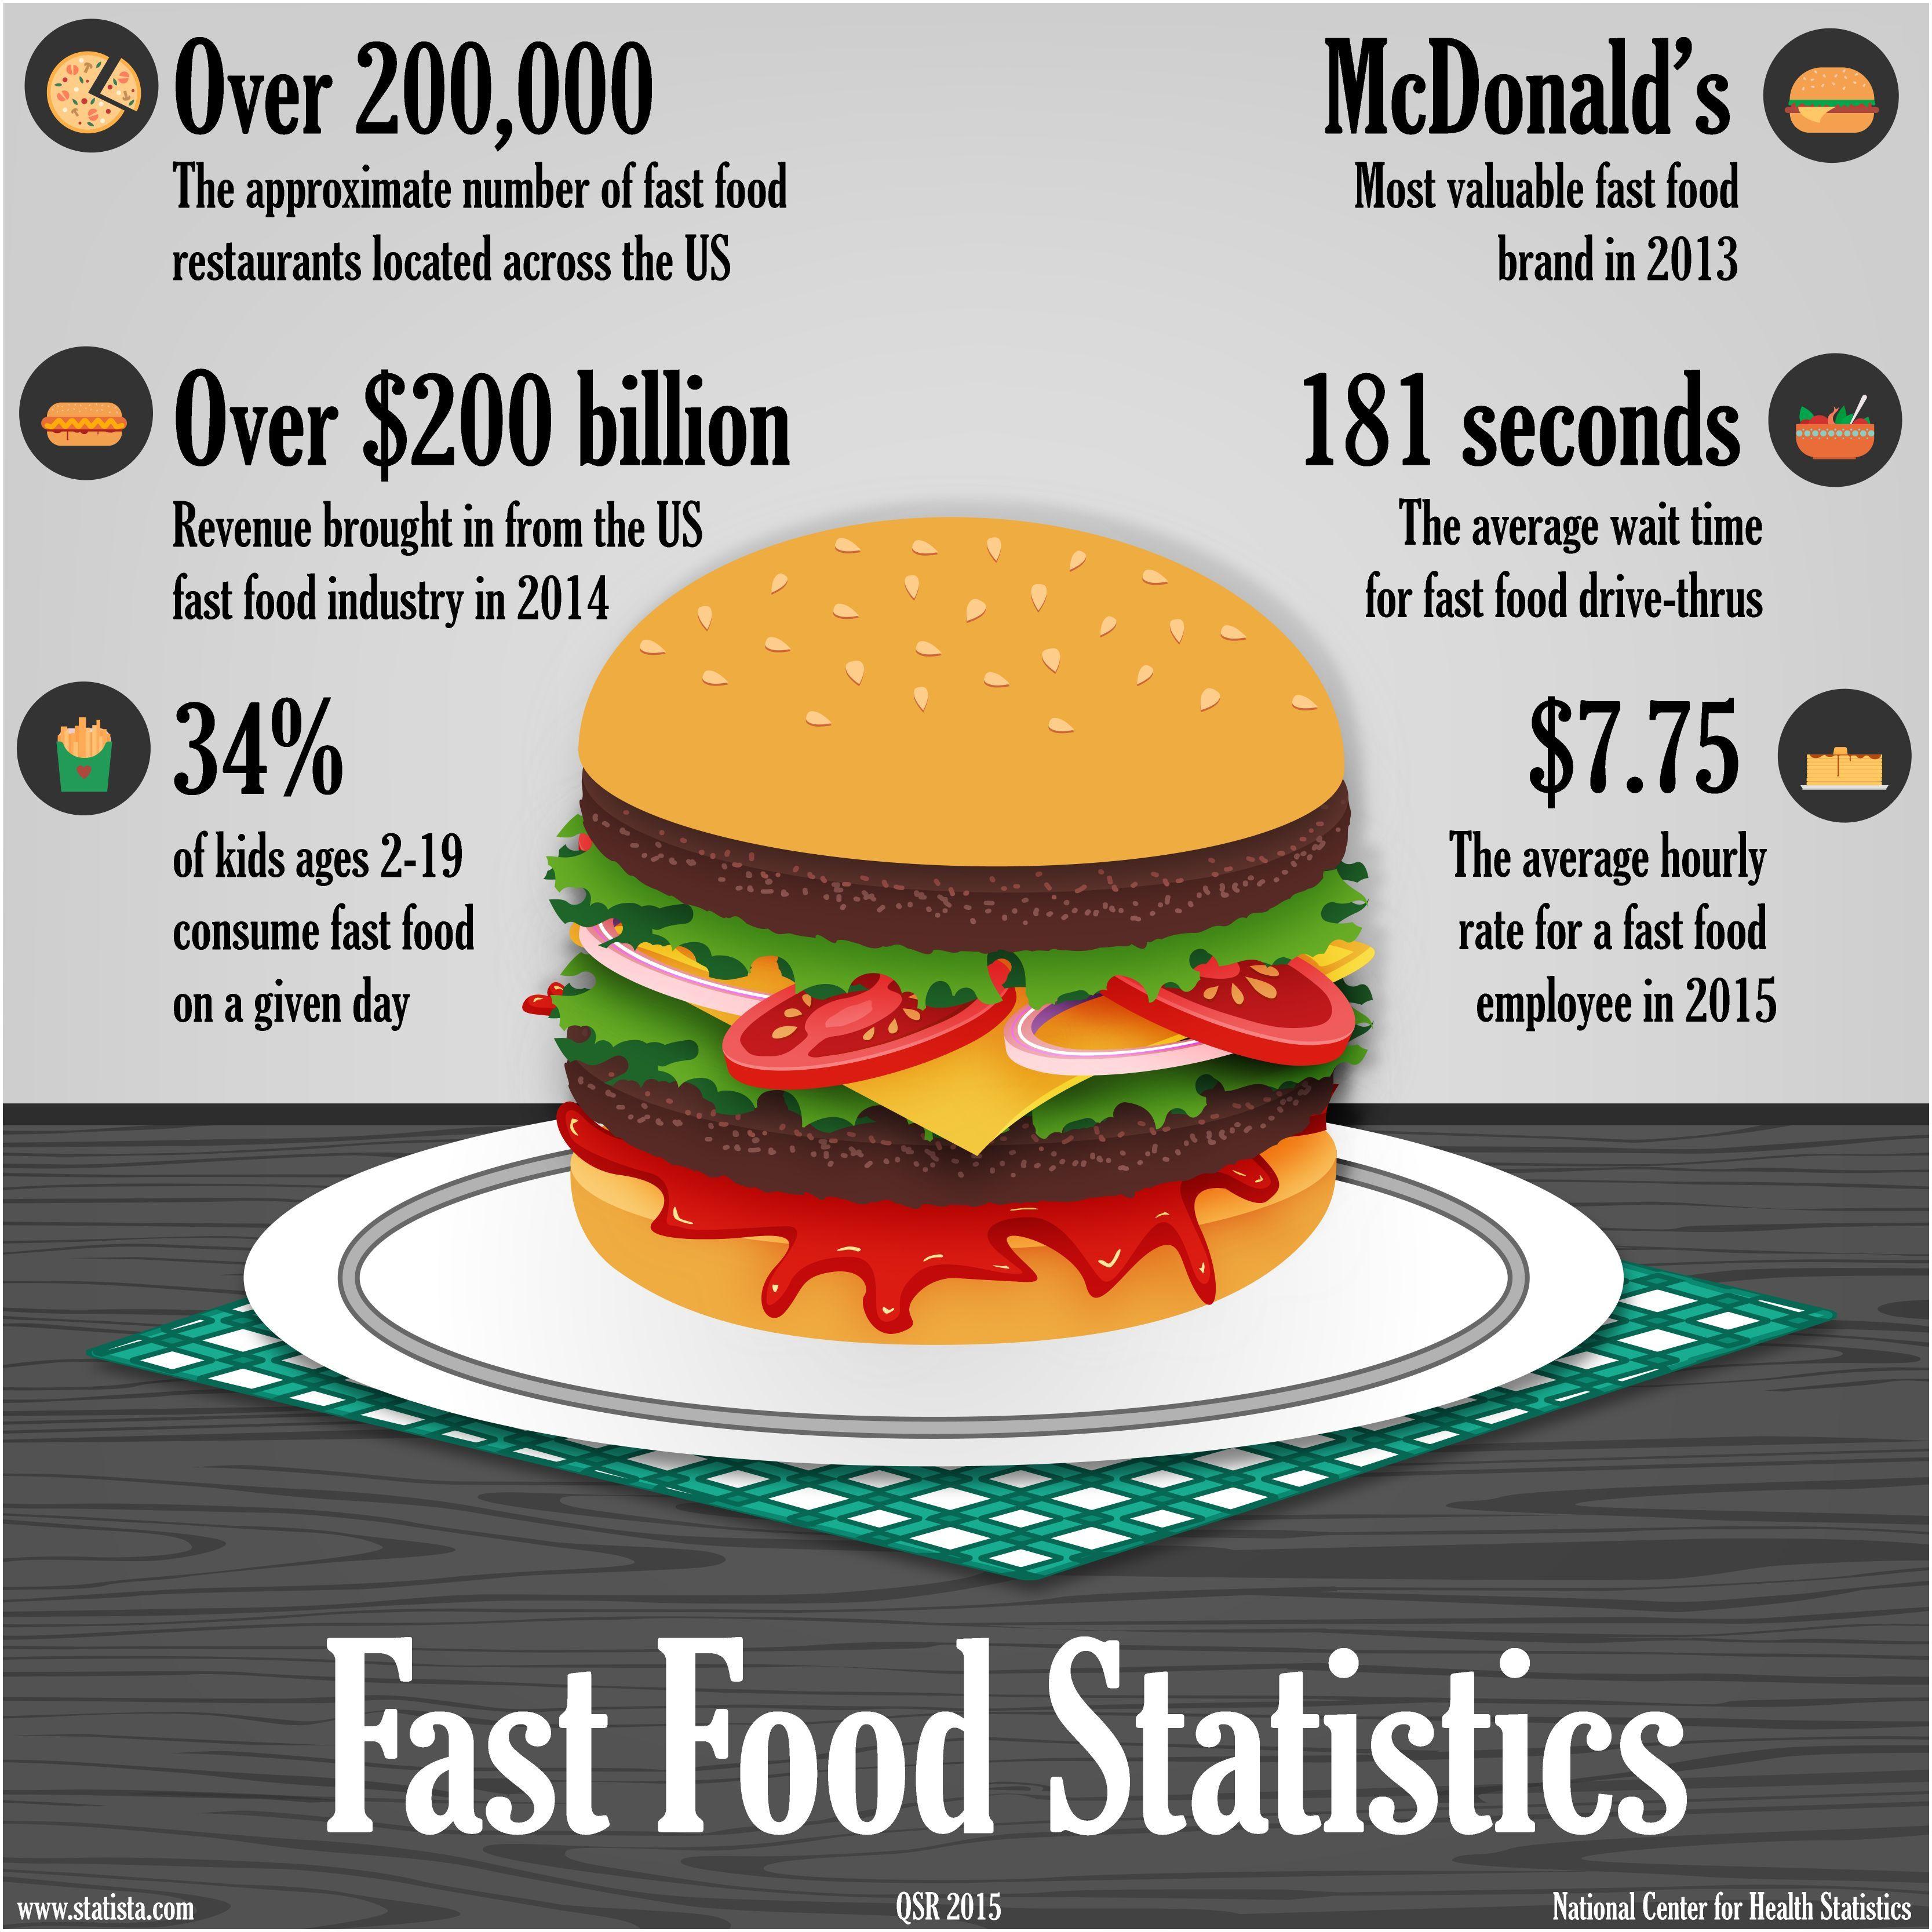 Fast Food Statistics RMagazine Business Restaurant Management Infographic